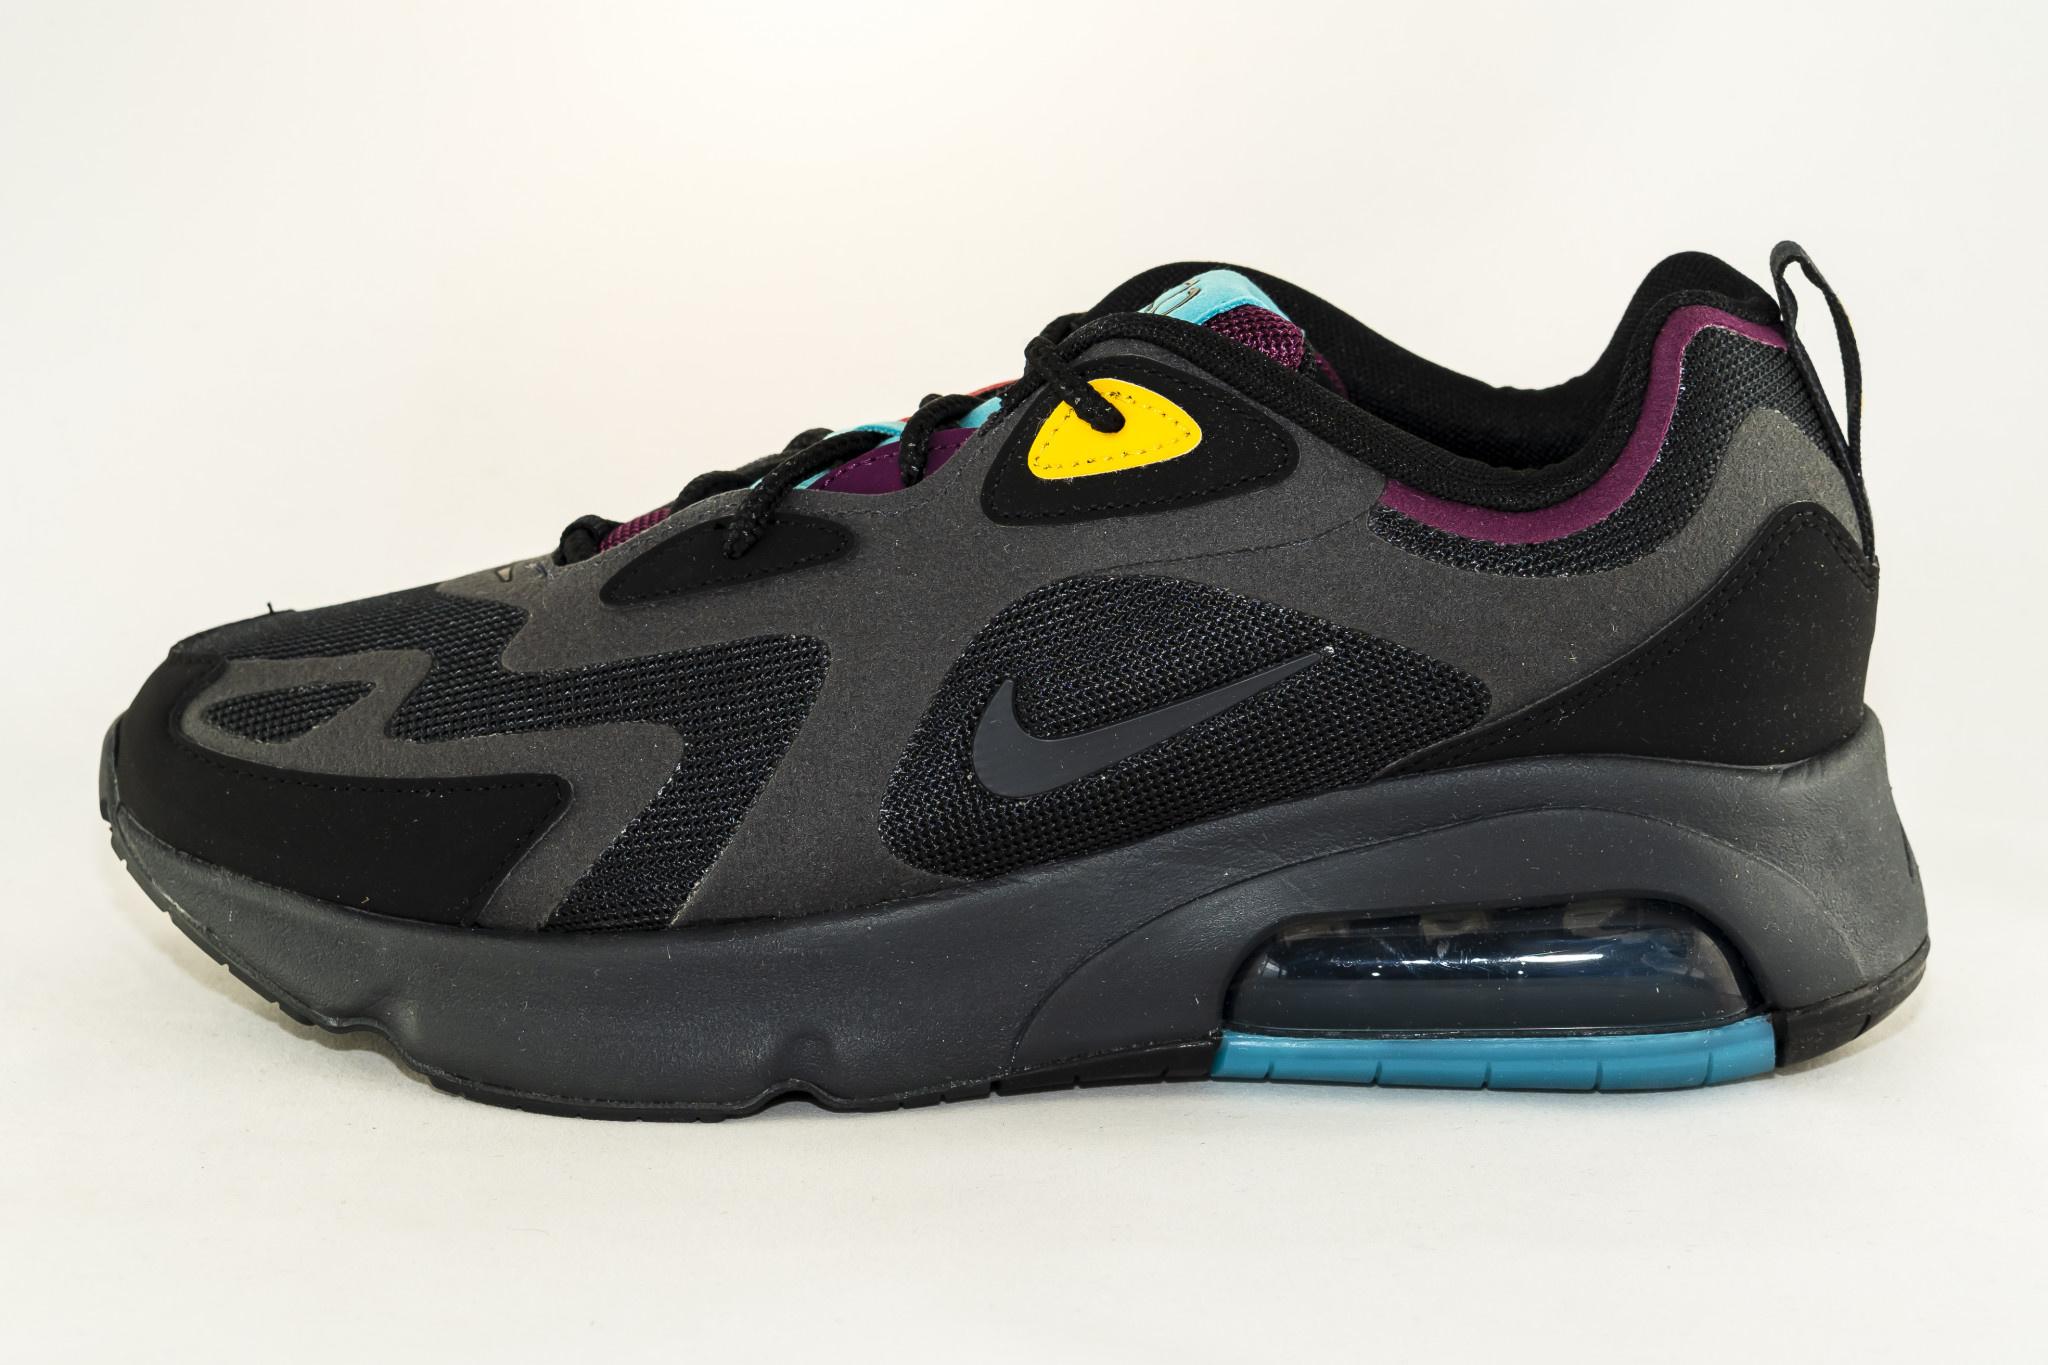 Nike  AIR MAX 200 Black/ Anthracite/ Bordeaux